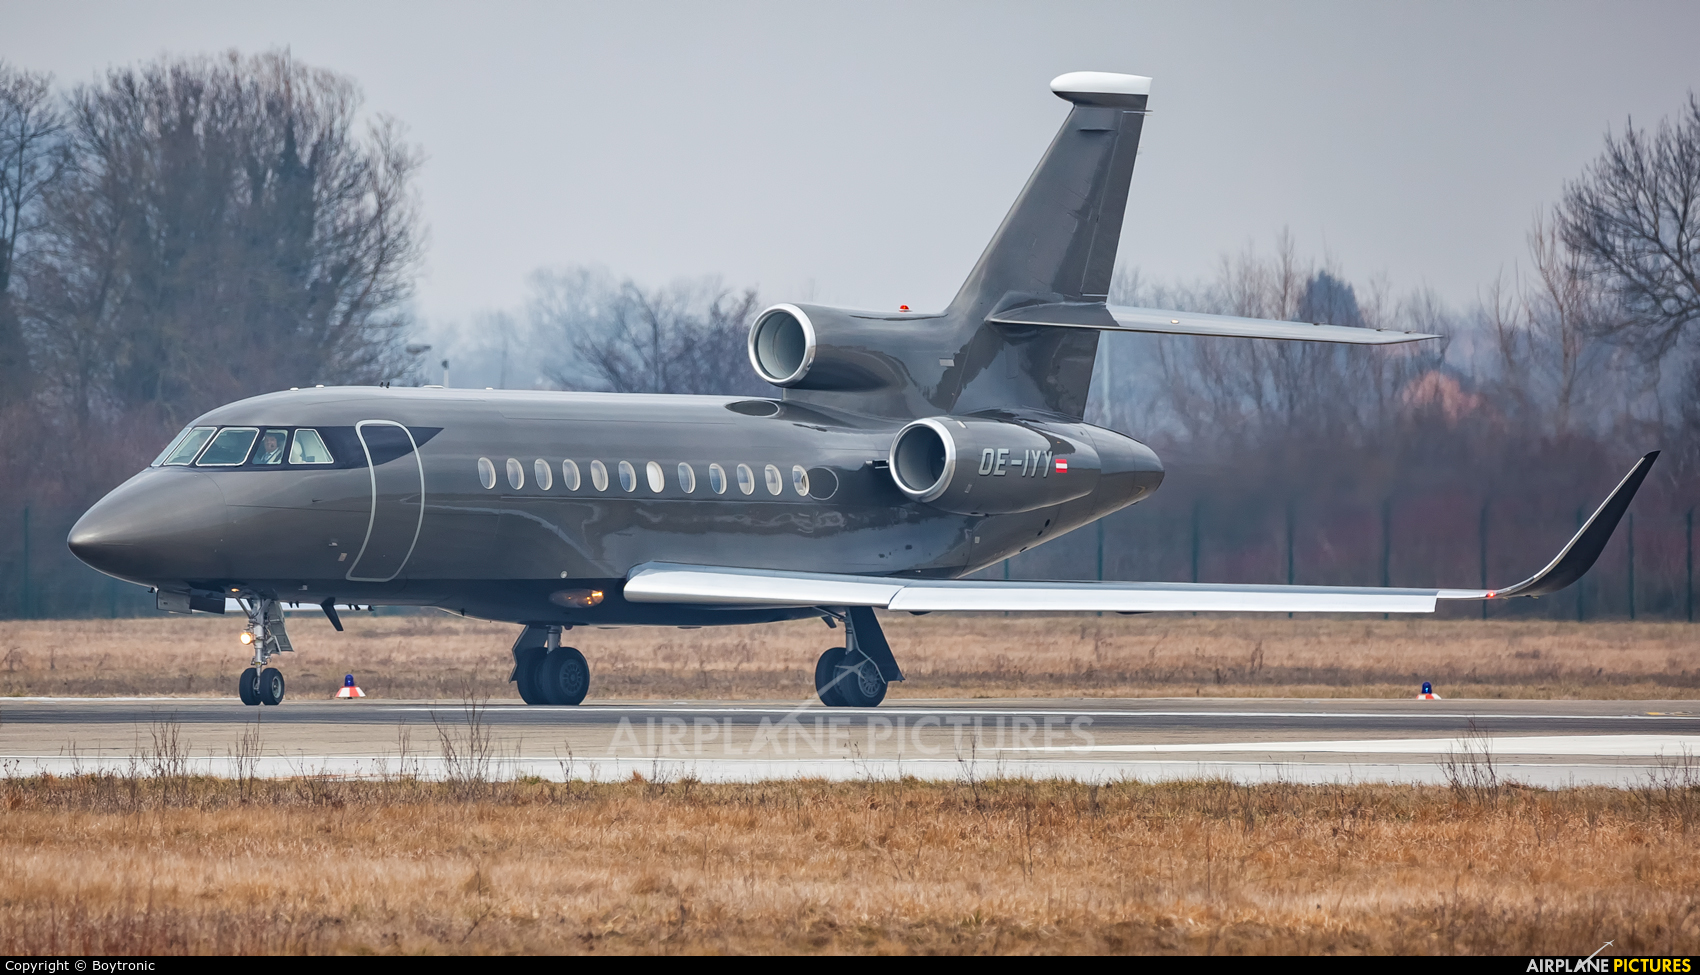 Salzburg Jet Aviation OE-IYY aircraft at Zagreb